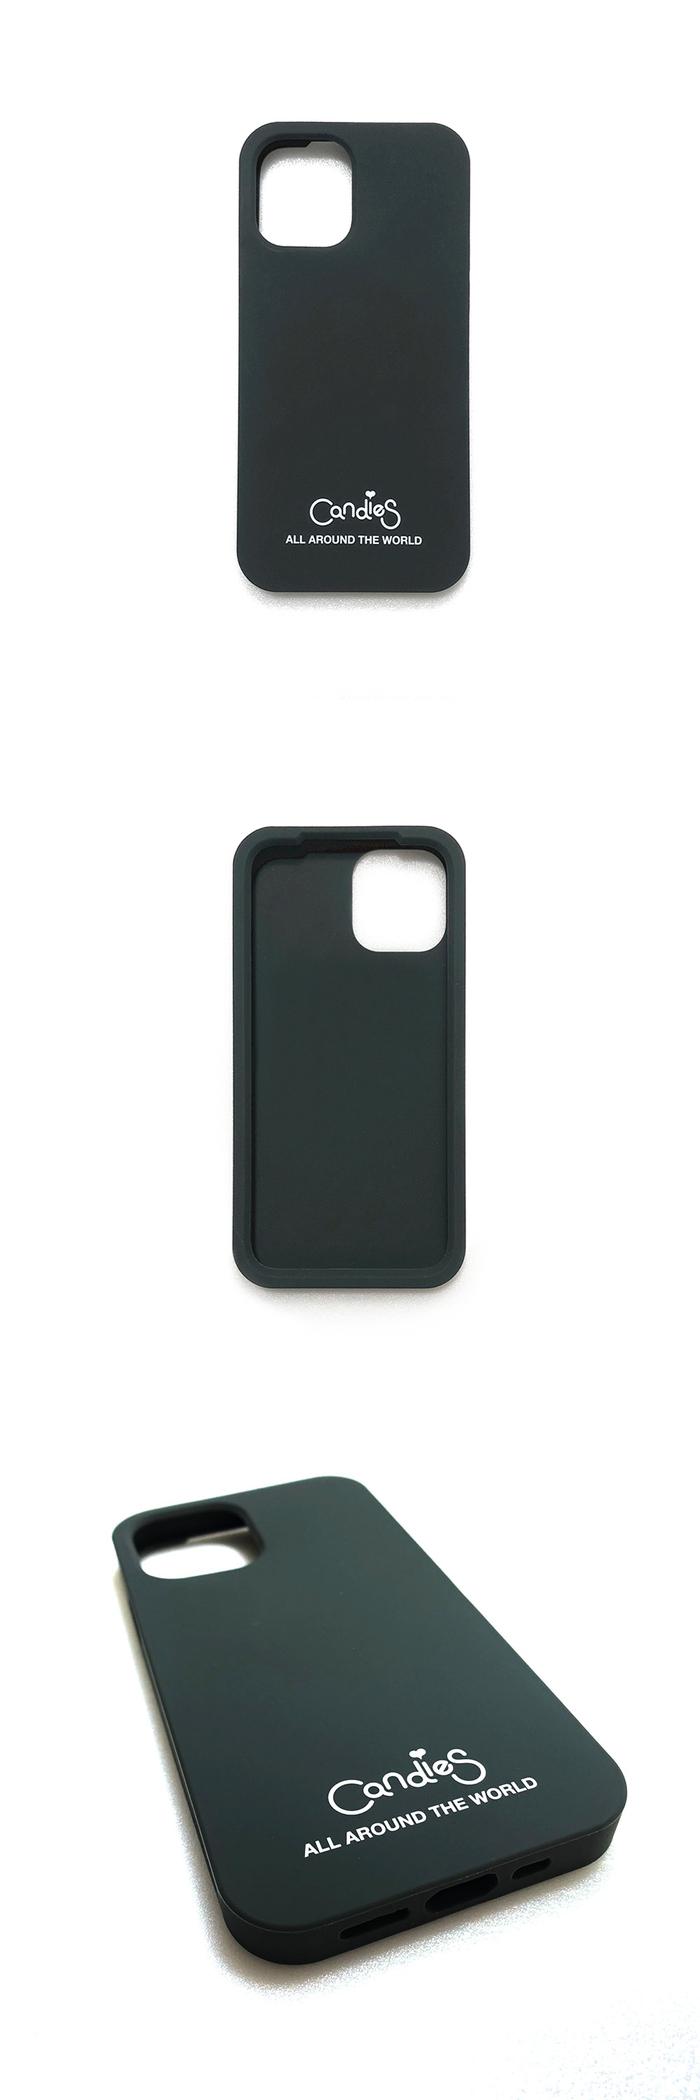 (複製)Candies|Simple系列 Candies logo素面殼(灰) - iPhone 12/12 Pro